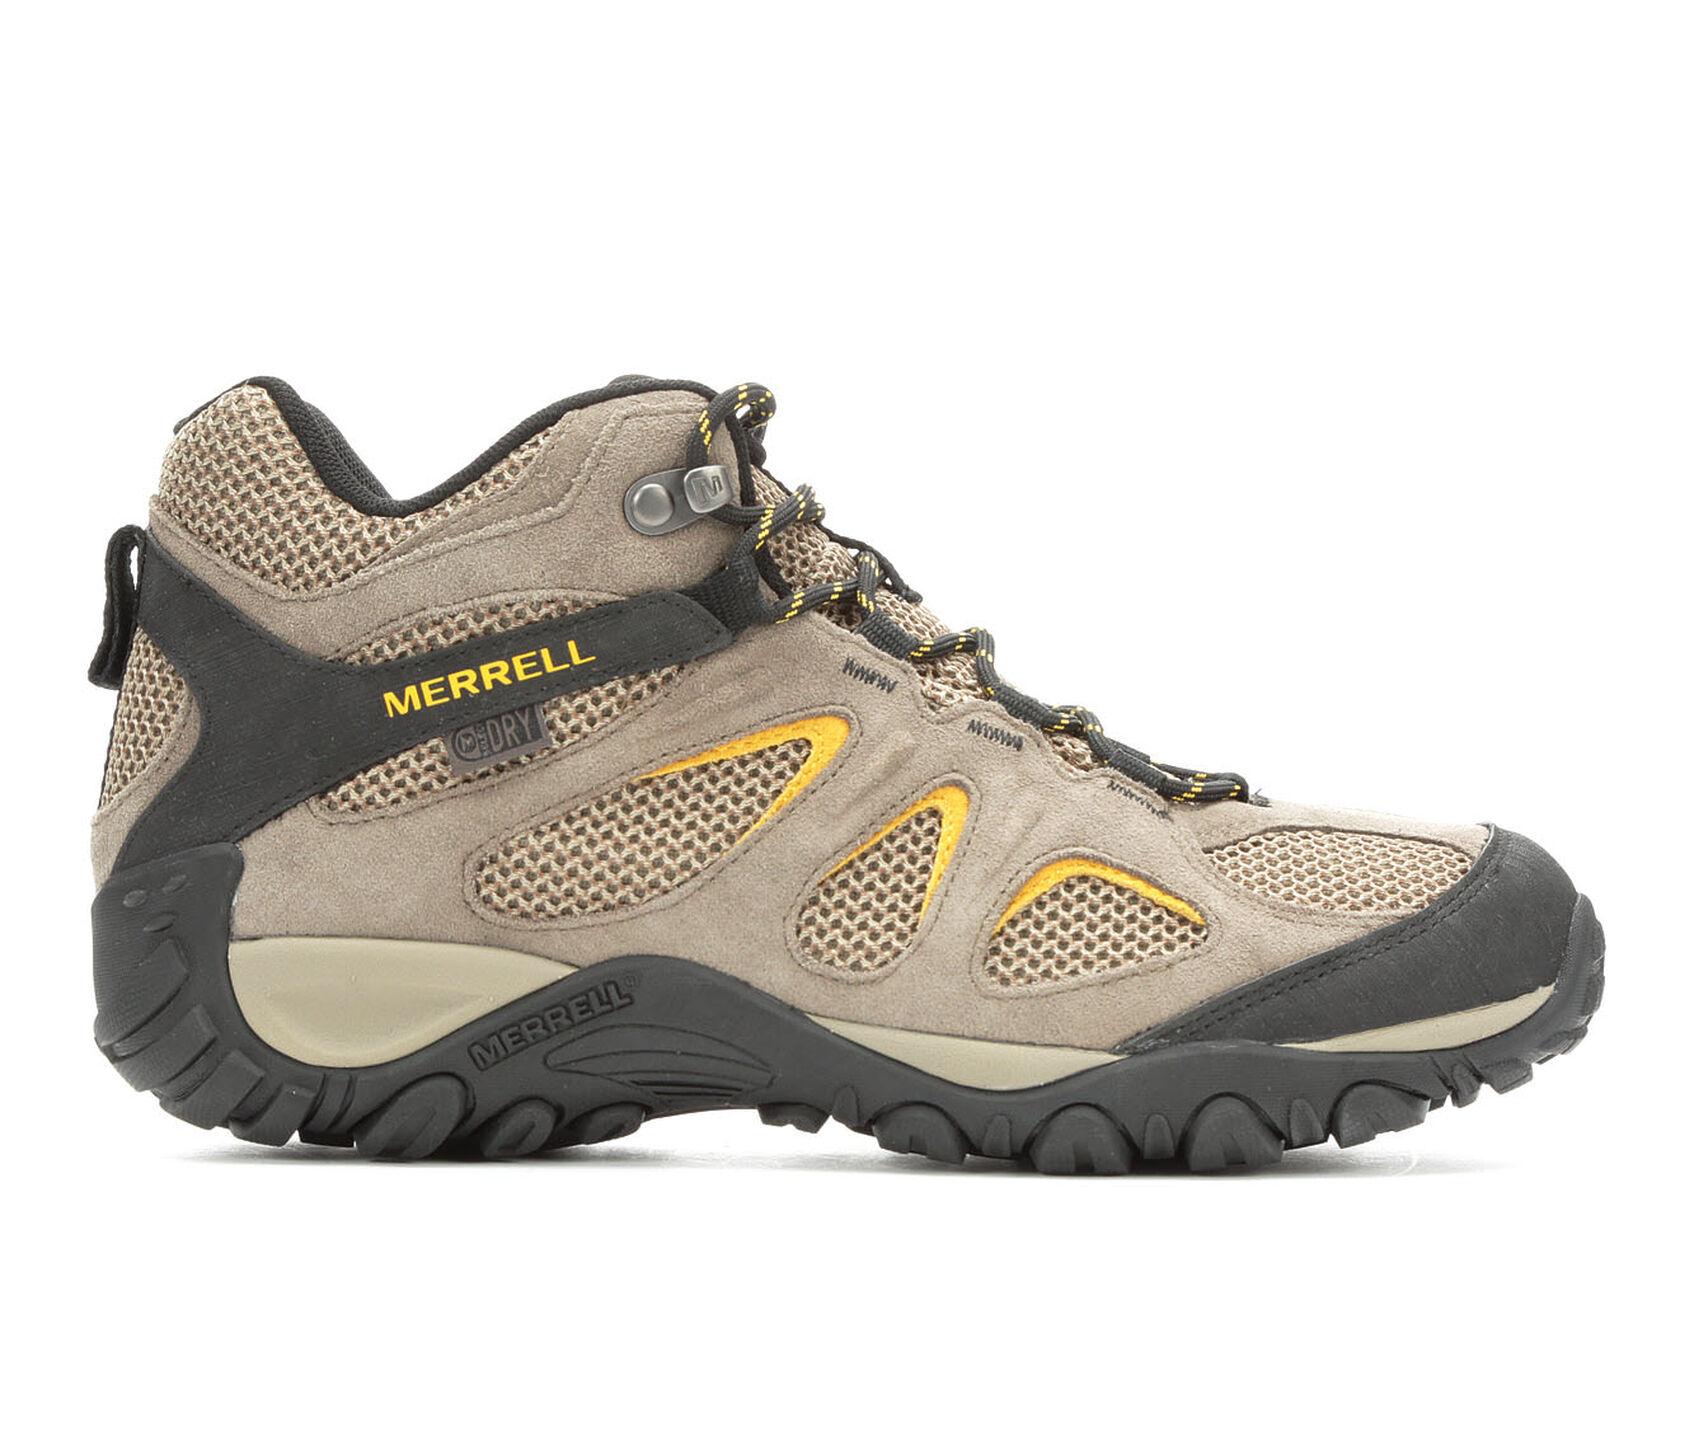 a4ac0d98a29 Men's Merrell Yokota II Mid Hiking Boots